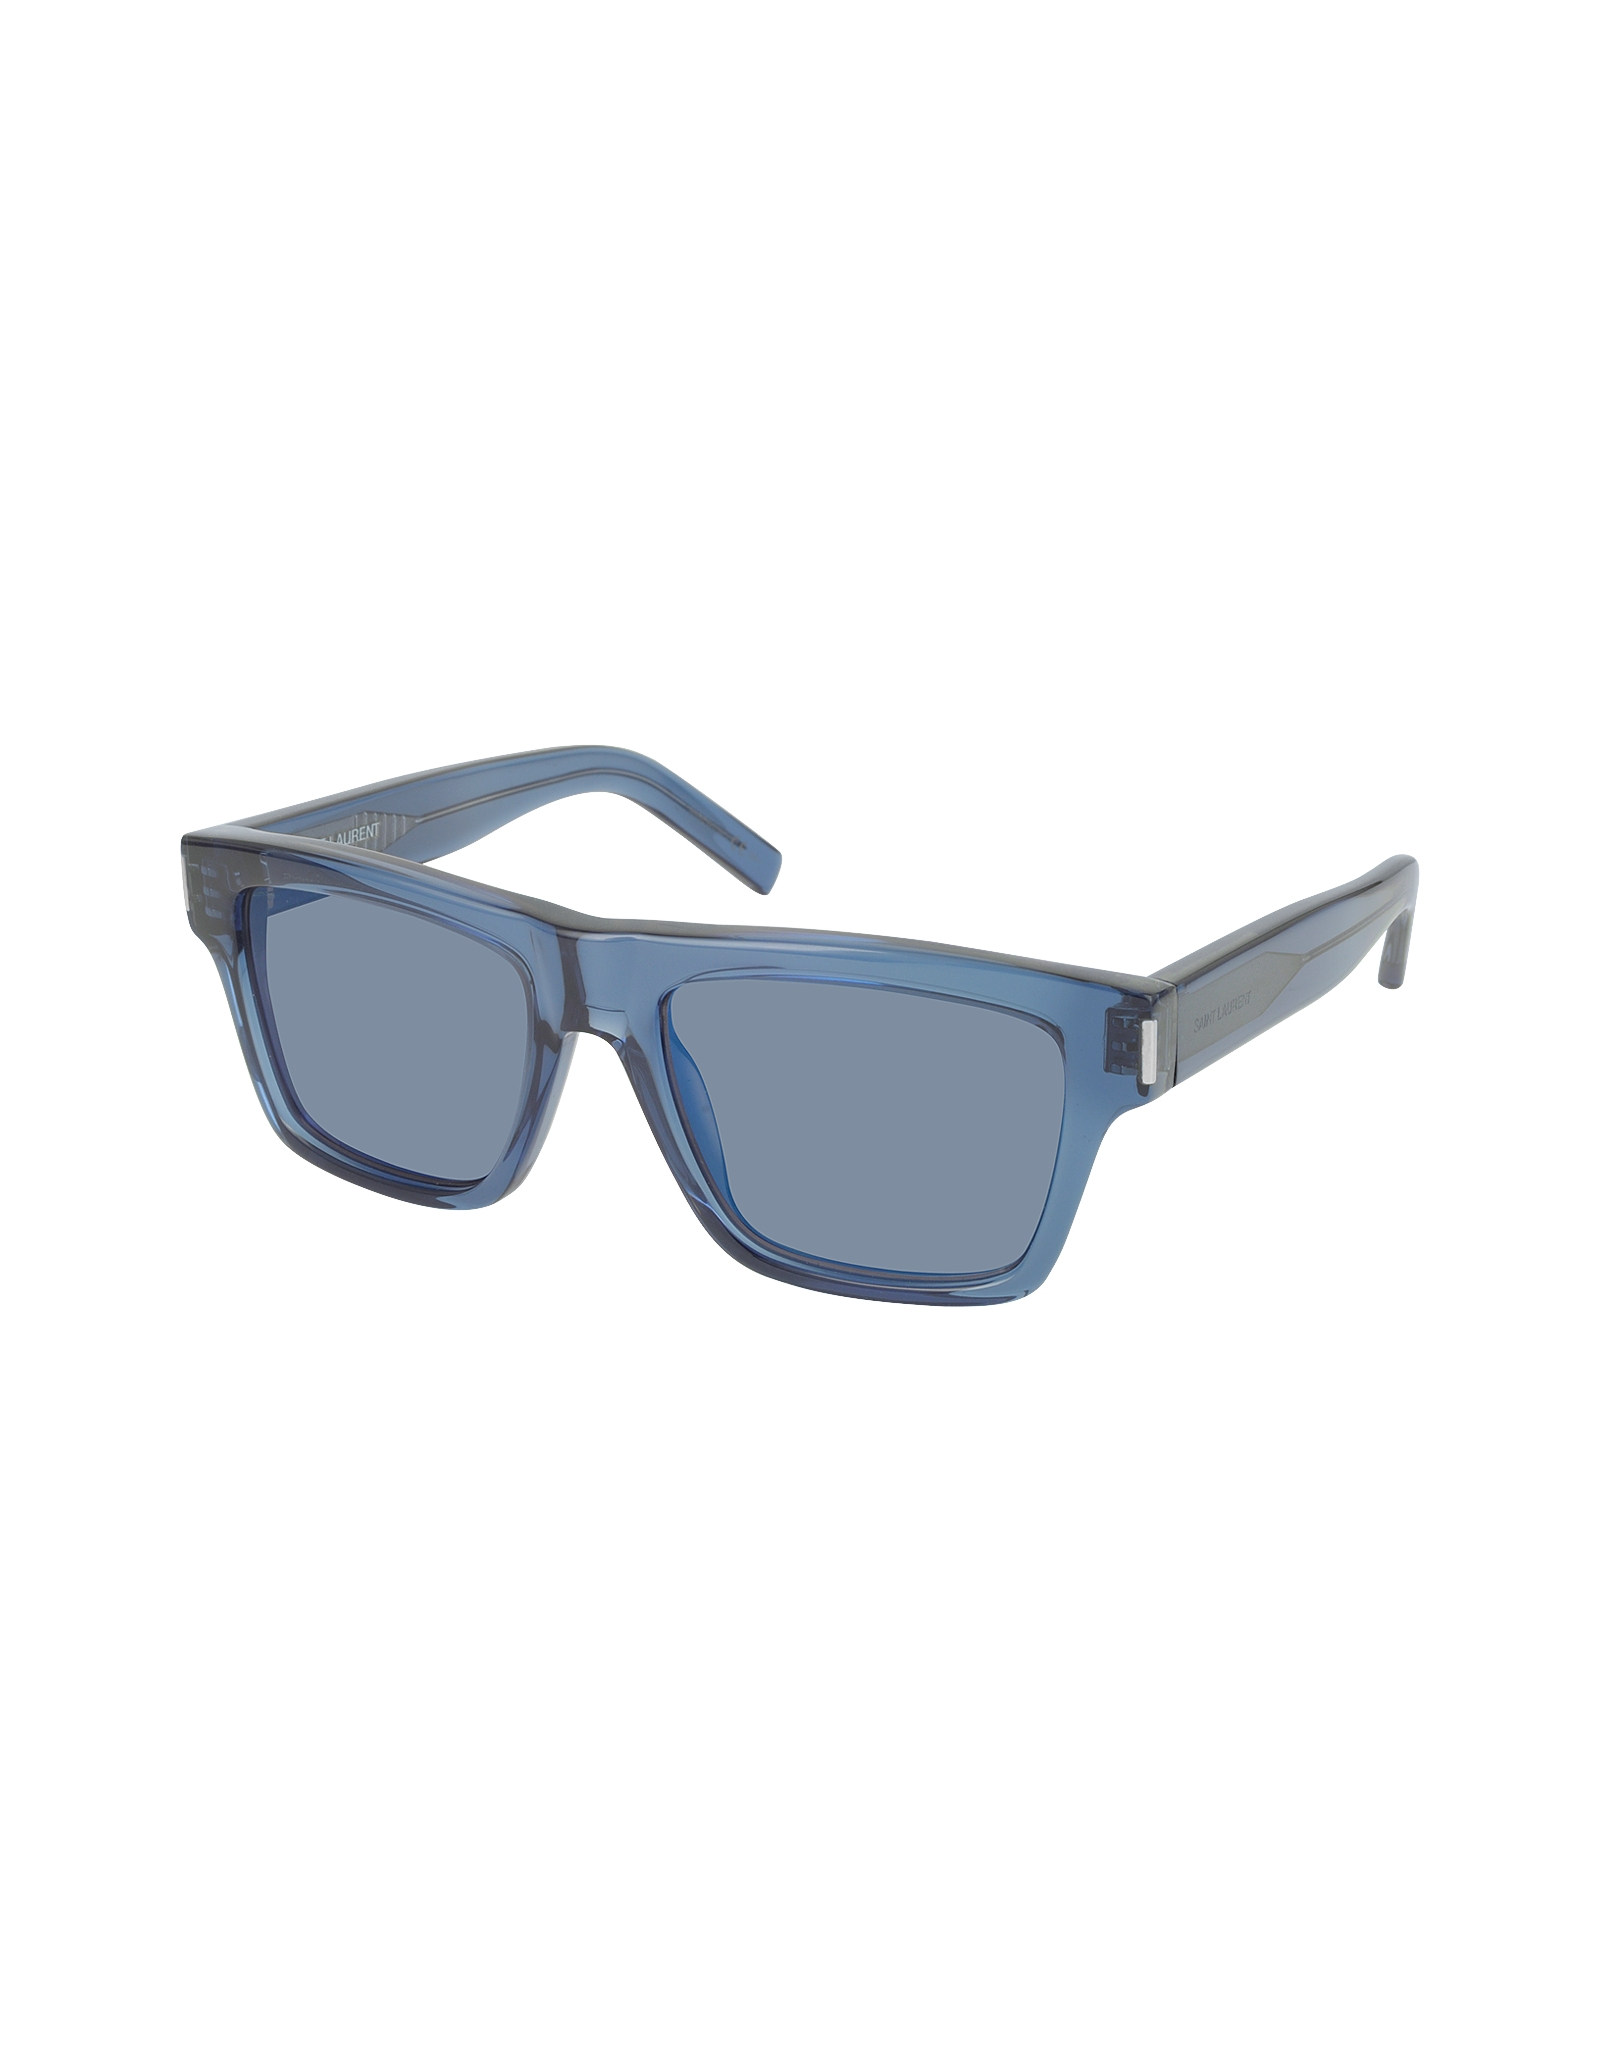 6af4db0bd52 Saint Laurent Bold 5 1gzxt Blue Acetate Sunglasses in Blue - Lyst